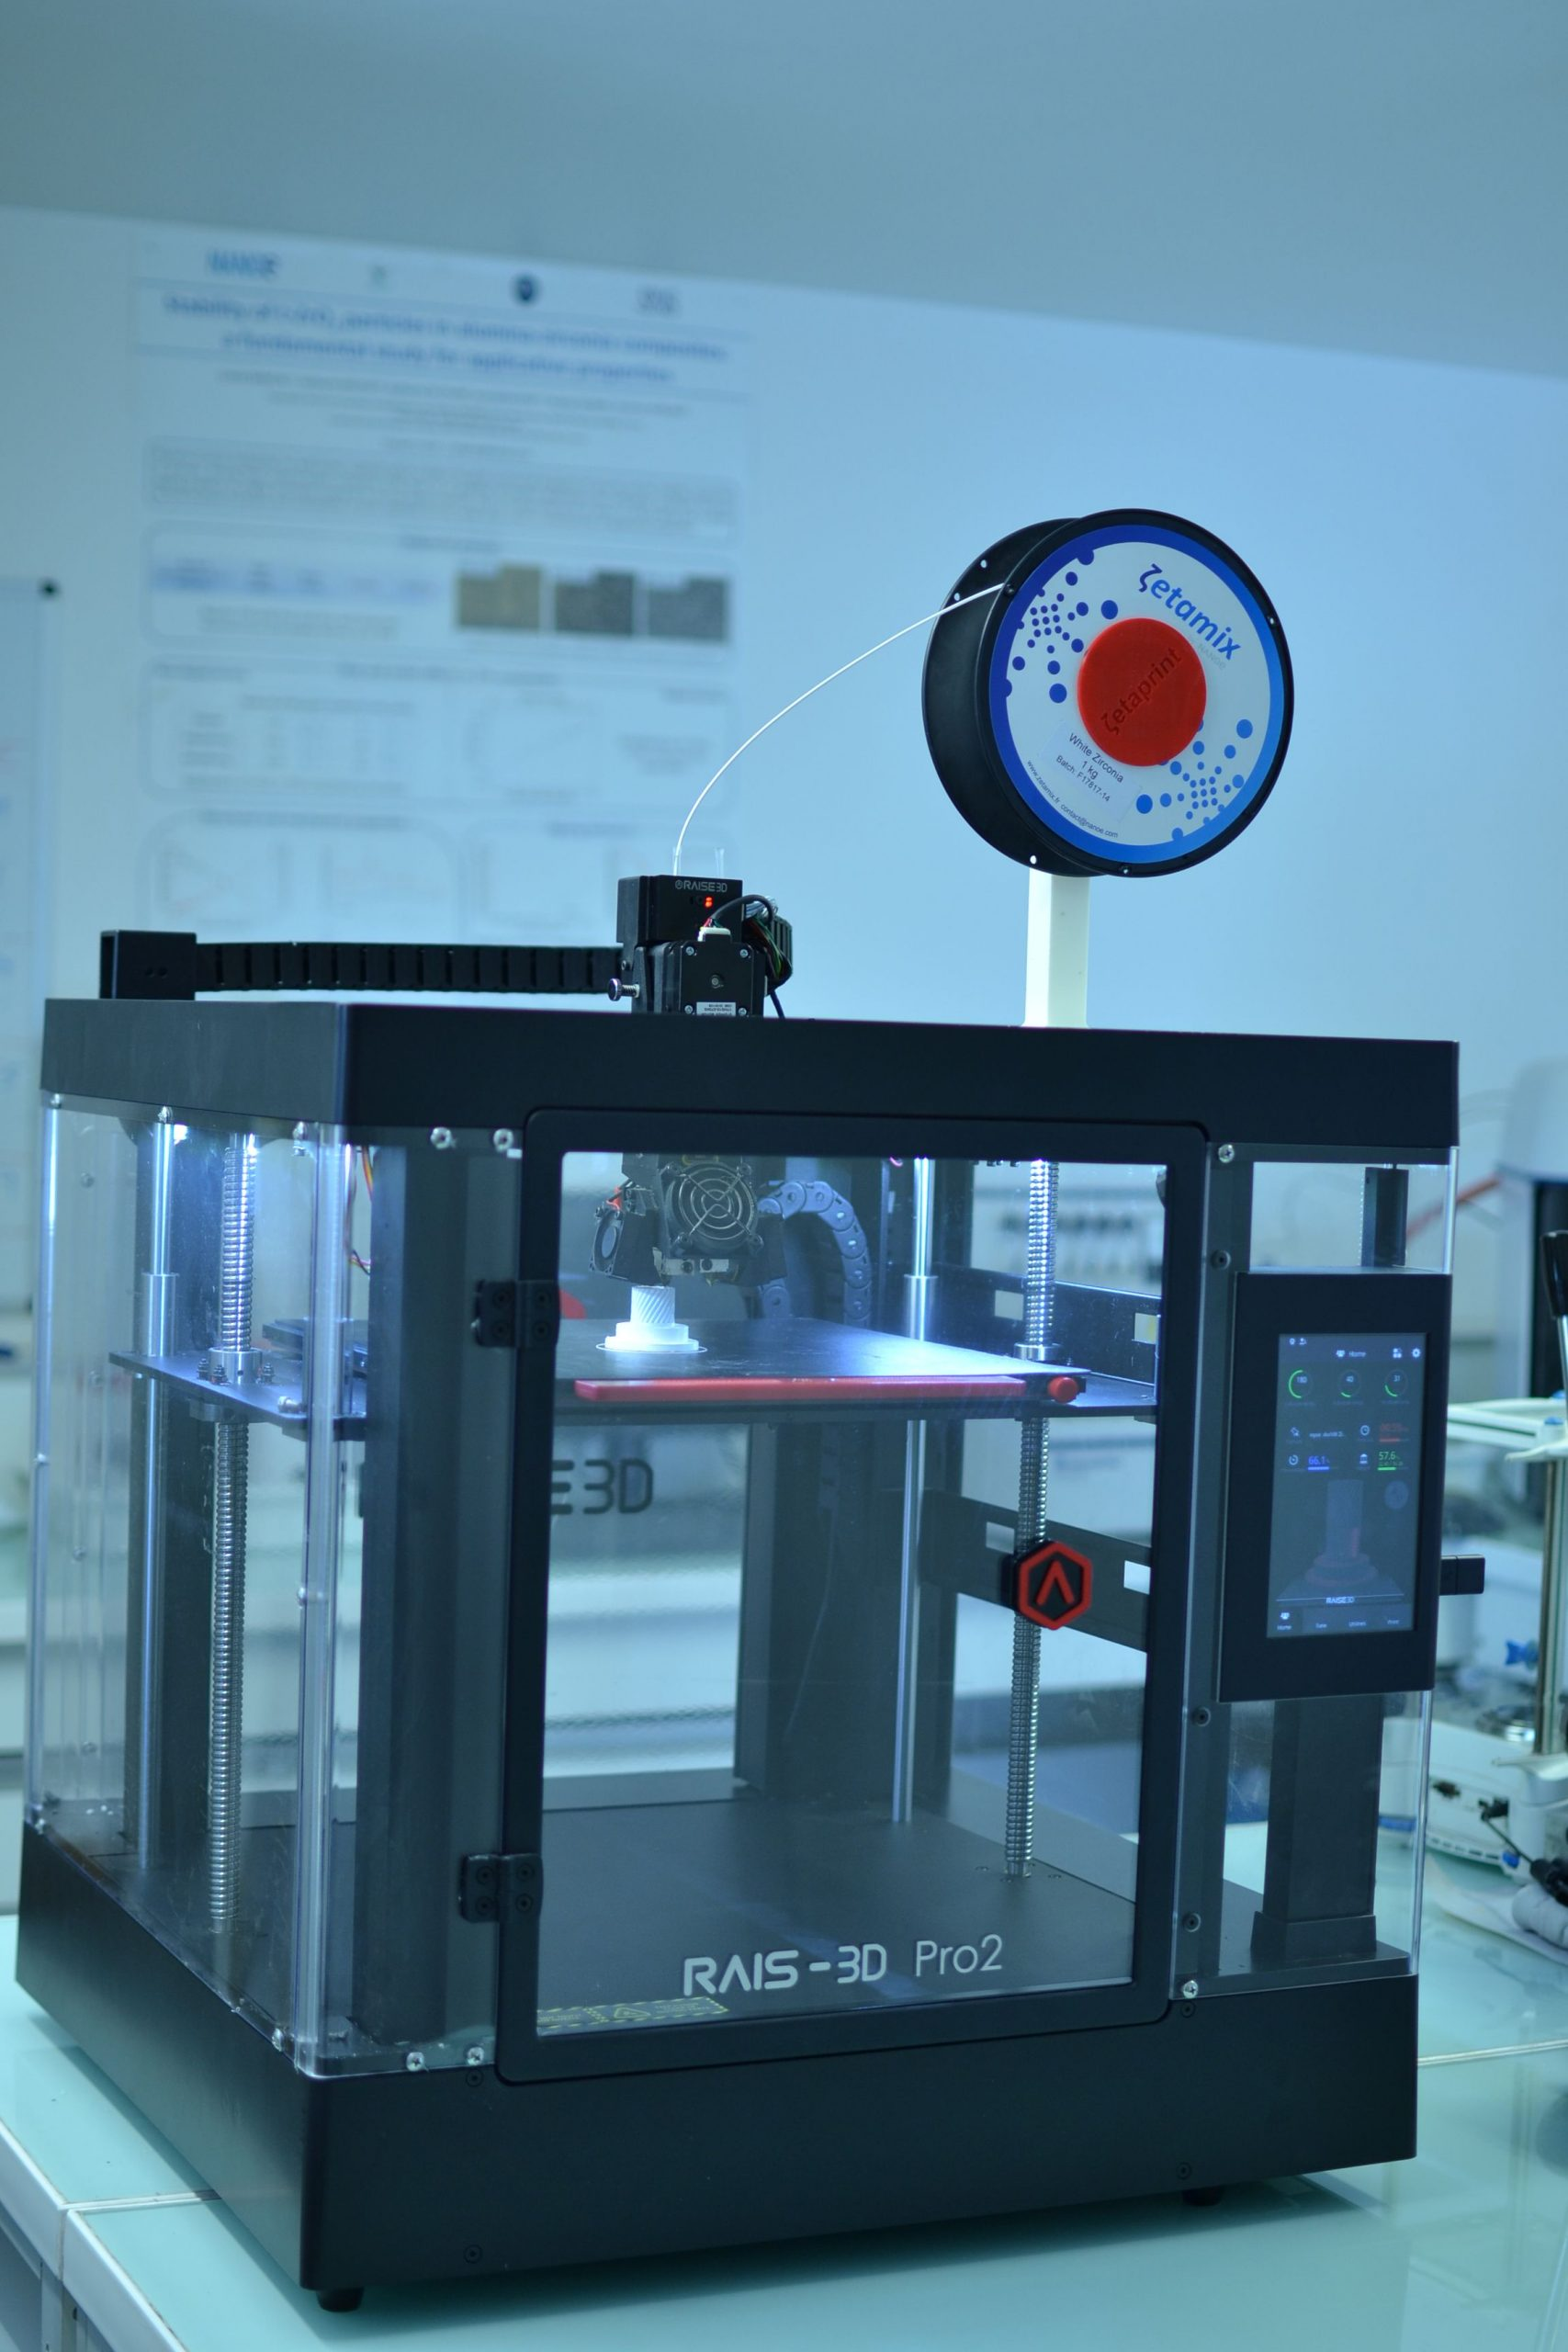 Zetaprint Nanoe - 3D printers